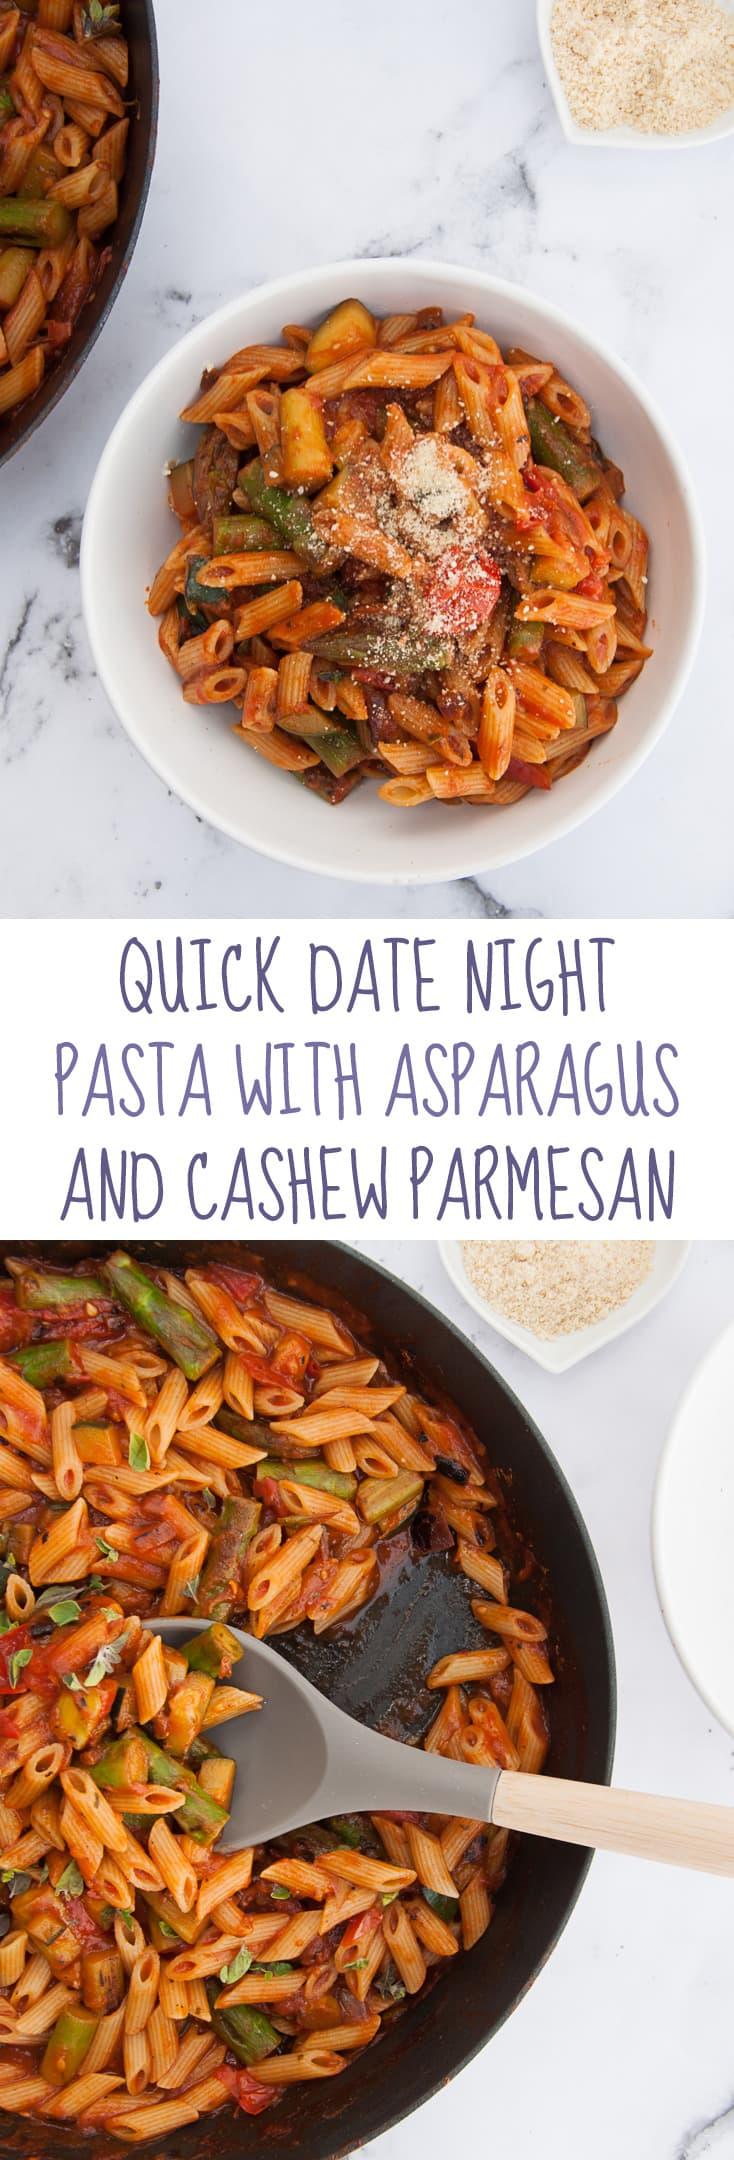 Quick Date Night Pasta with Asparagus and Cashew Parmesan | ElephantasticVegan.com